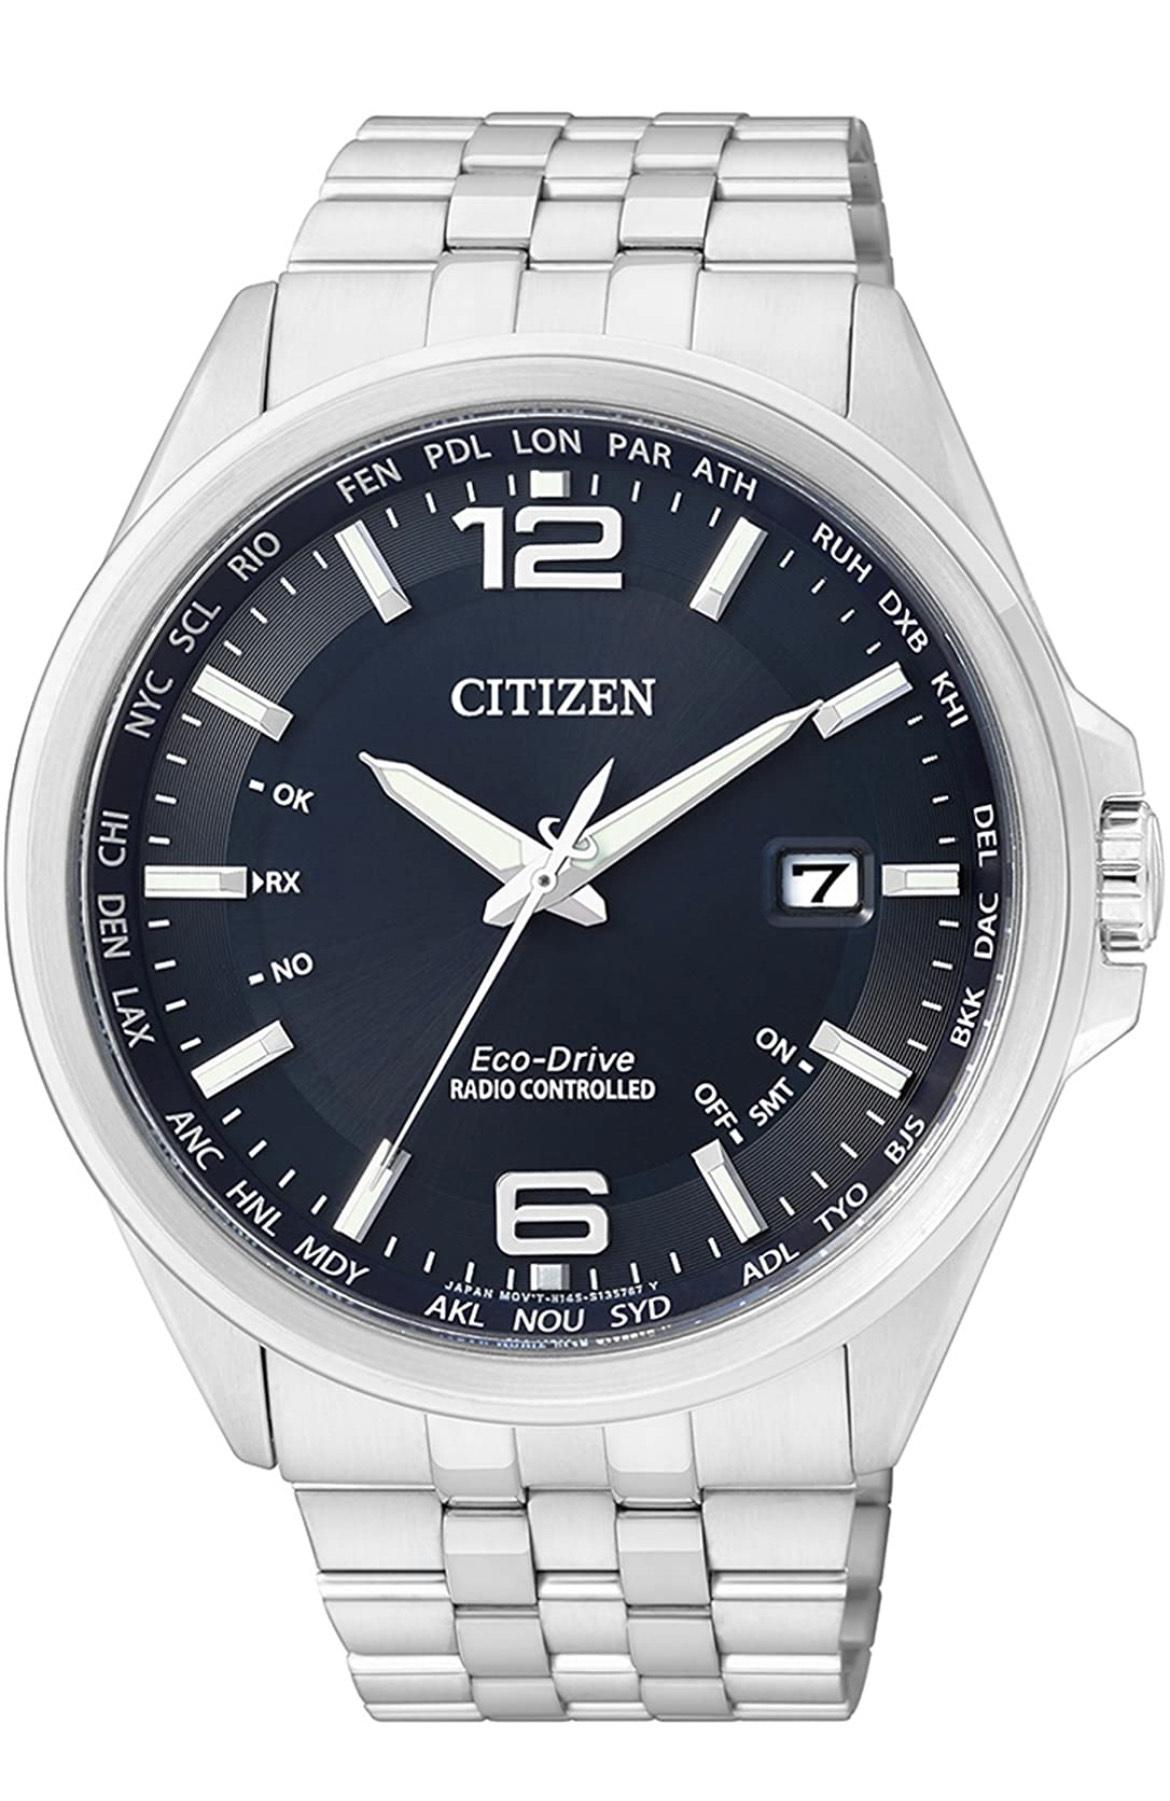 Citizen CB0010-88L - Blau - Herren - Funk - Eco Drive